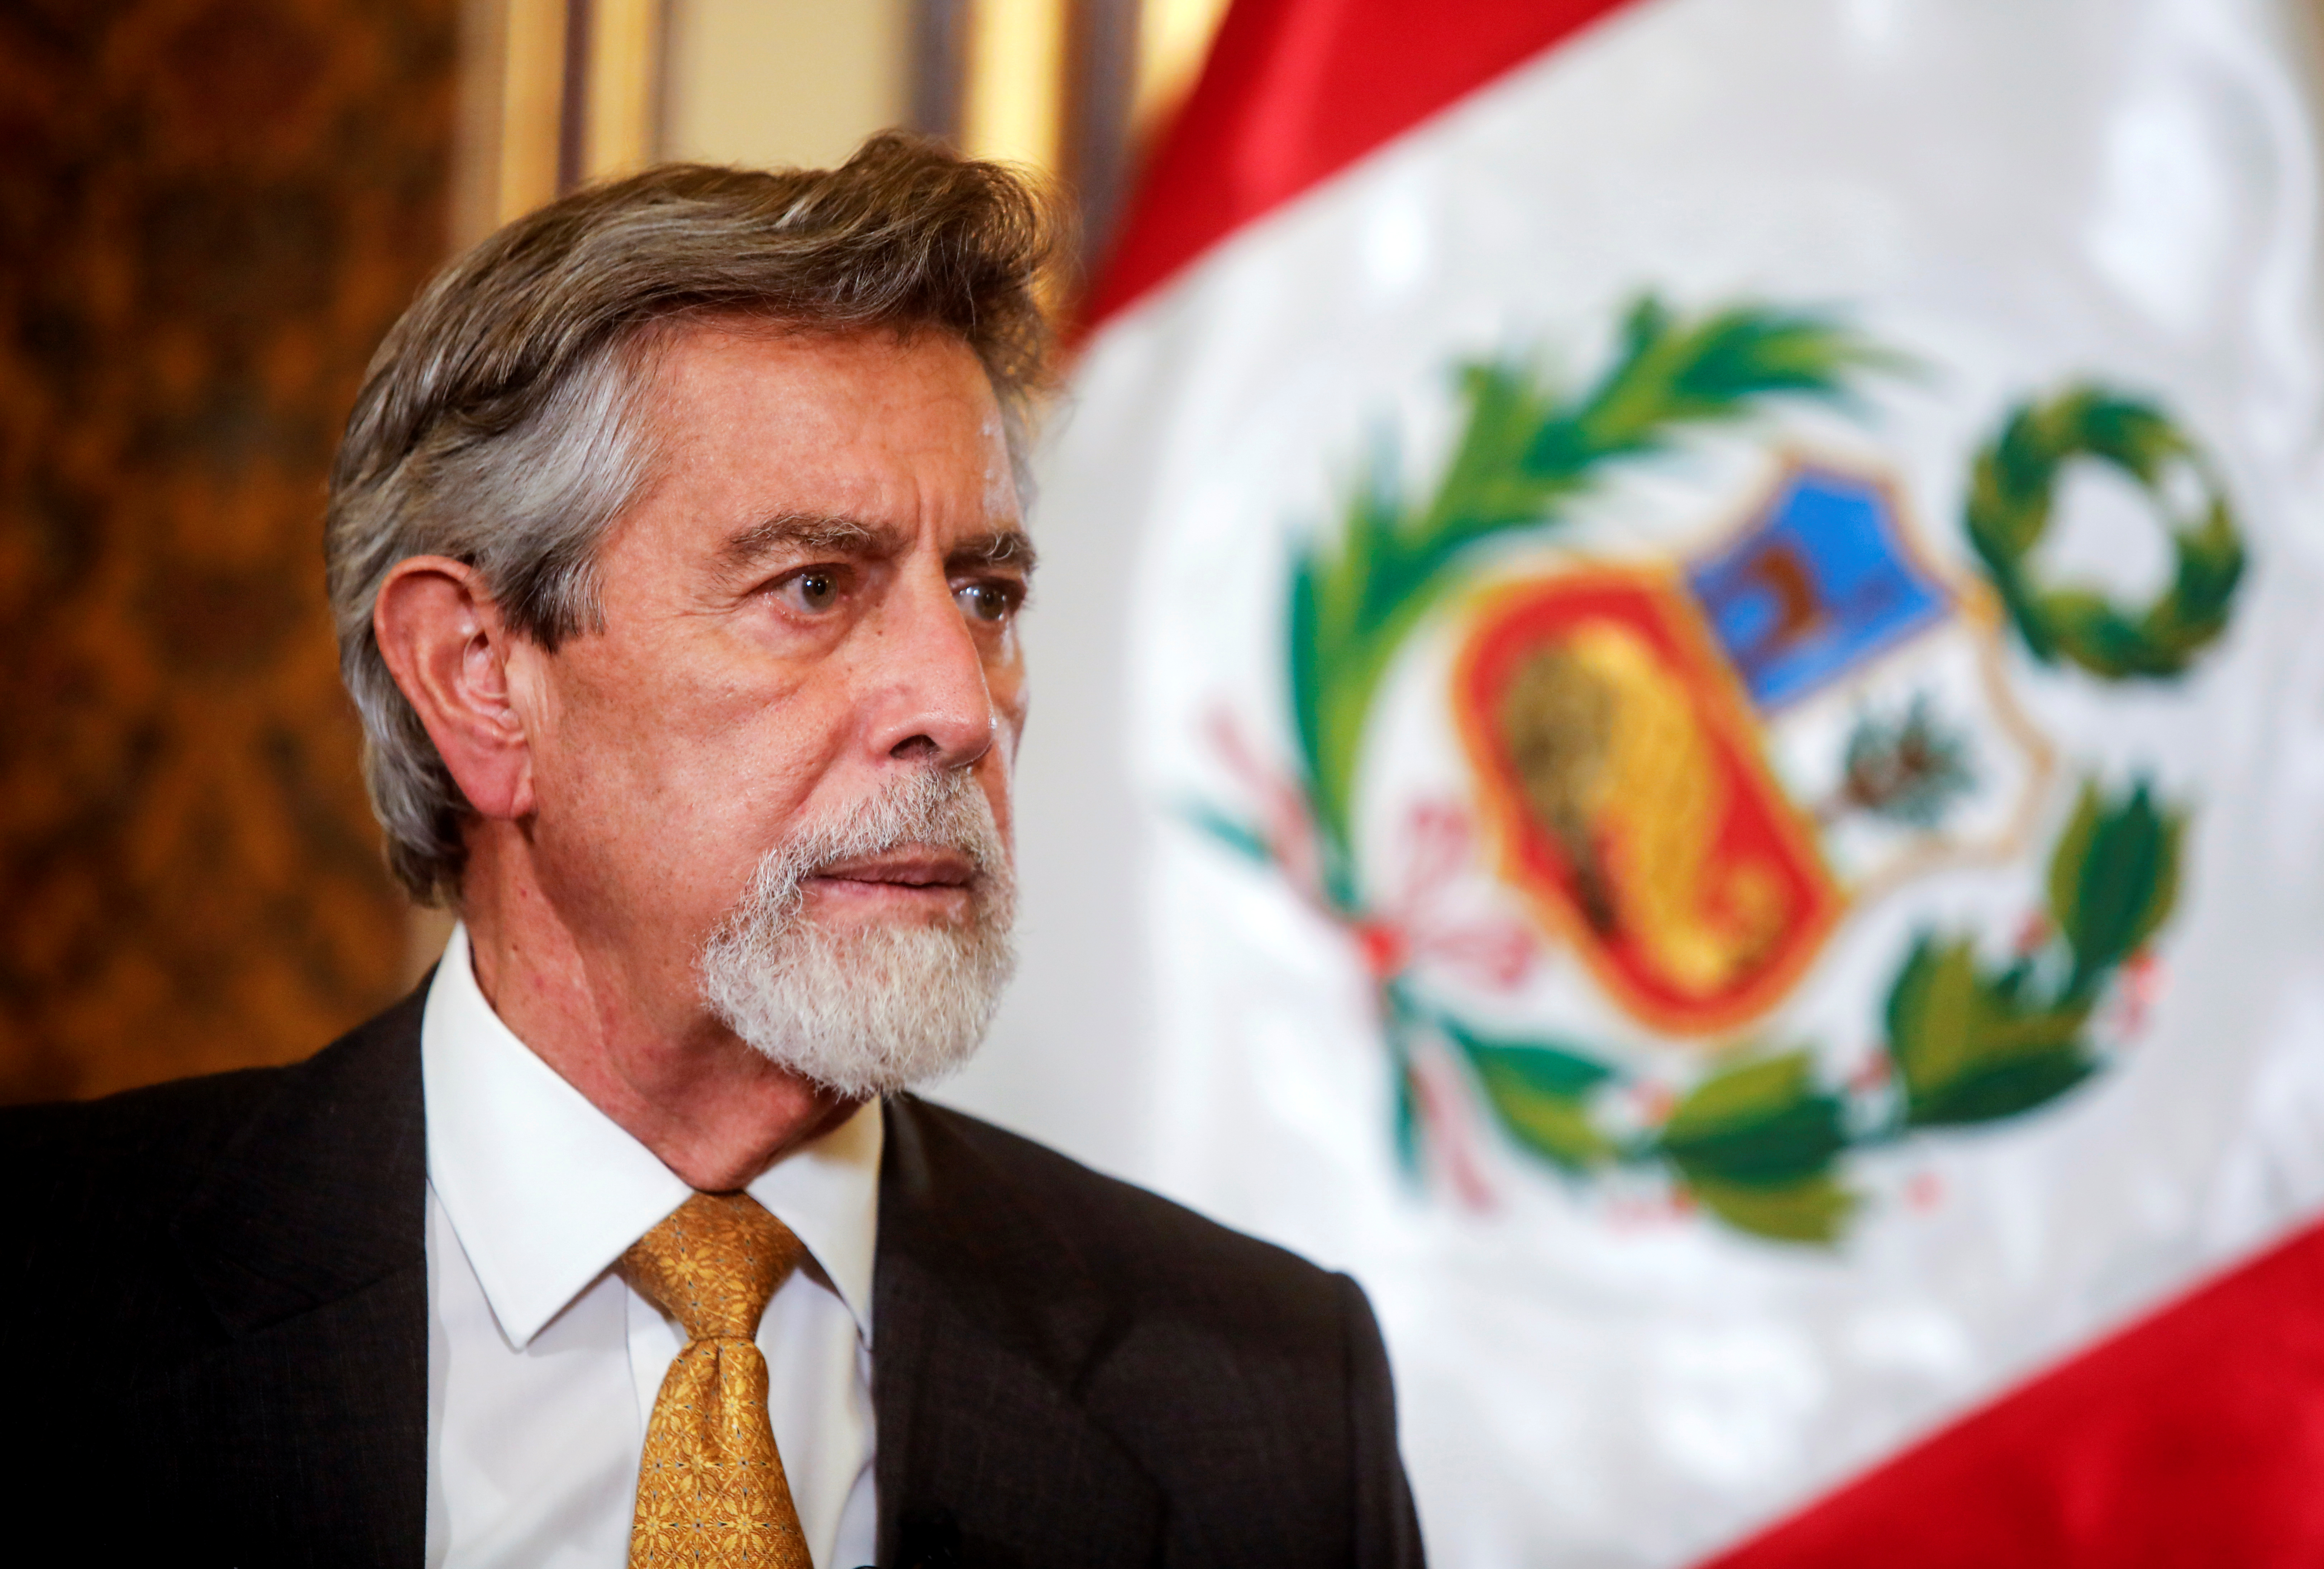 Peru's interim President Francisco Sagasti talks to Reuters, in Lima, Peru November 19, 2020. Picture taken November 19, 2020. REUTERS/Sebastian Castaneda